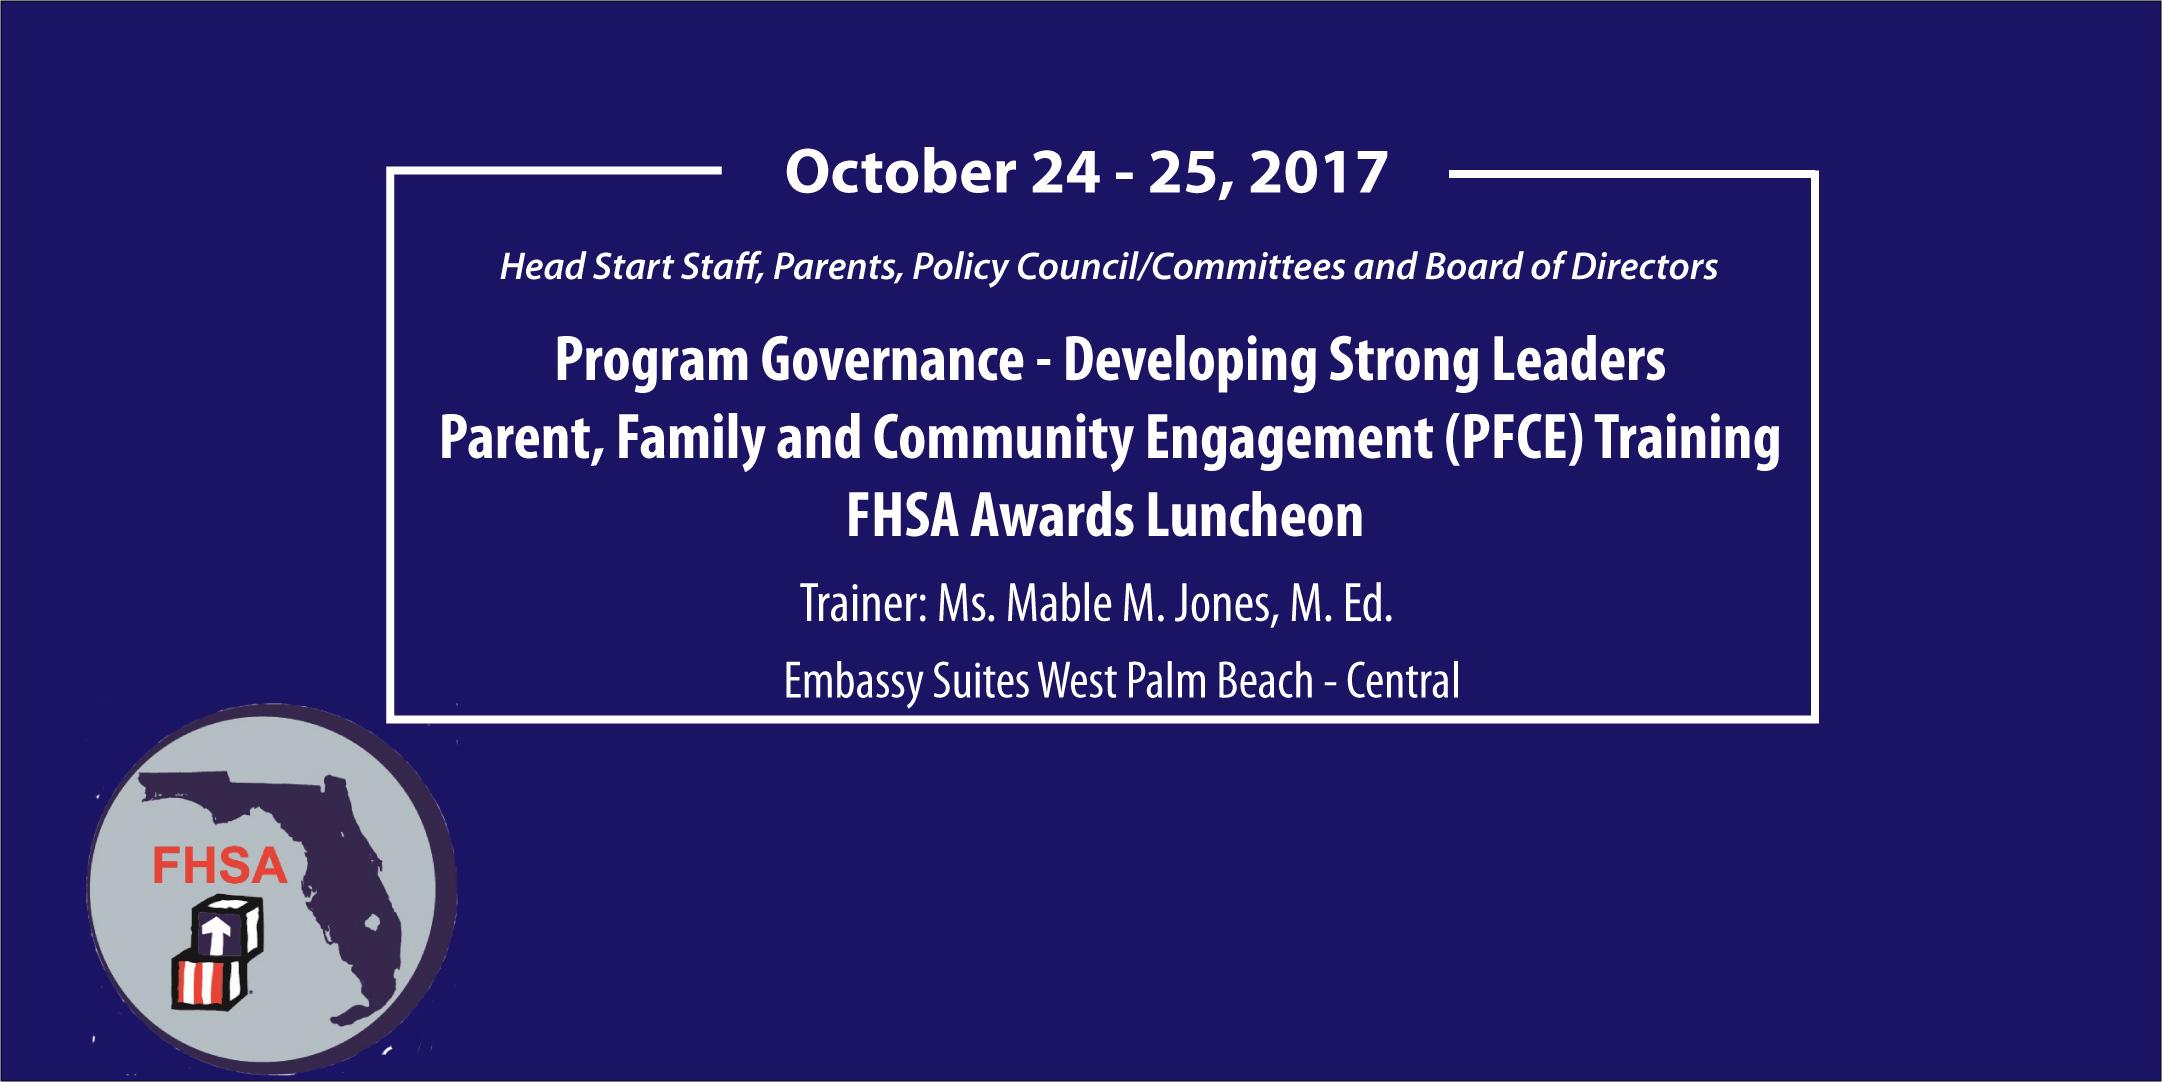 FHSA Program Governance, PFCE Traininig and Awards Luncheon